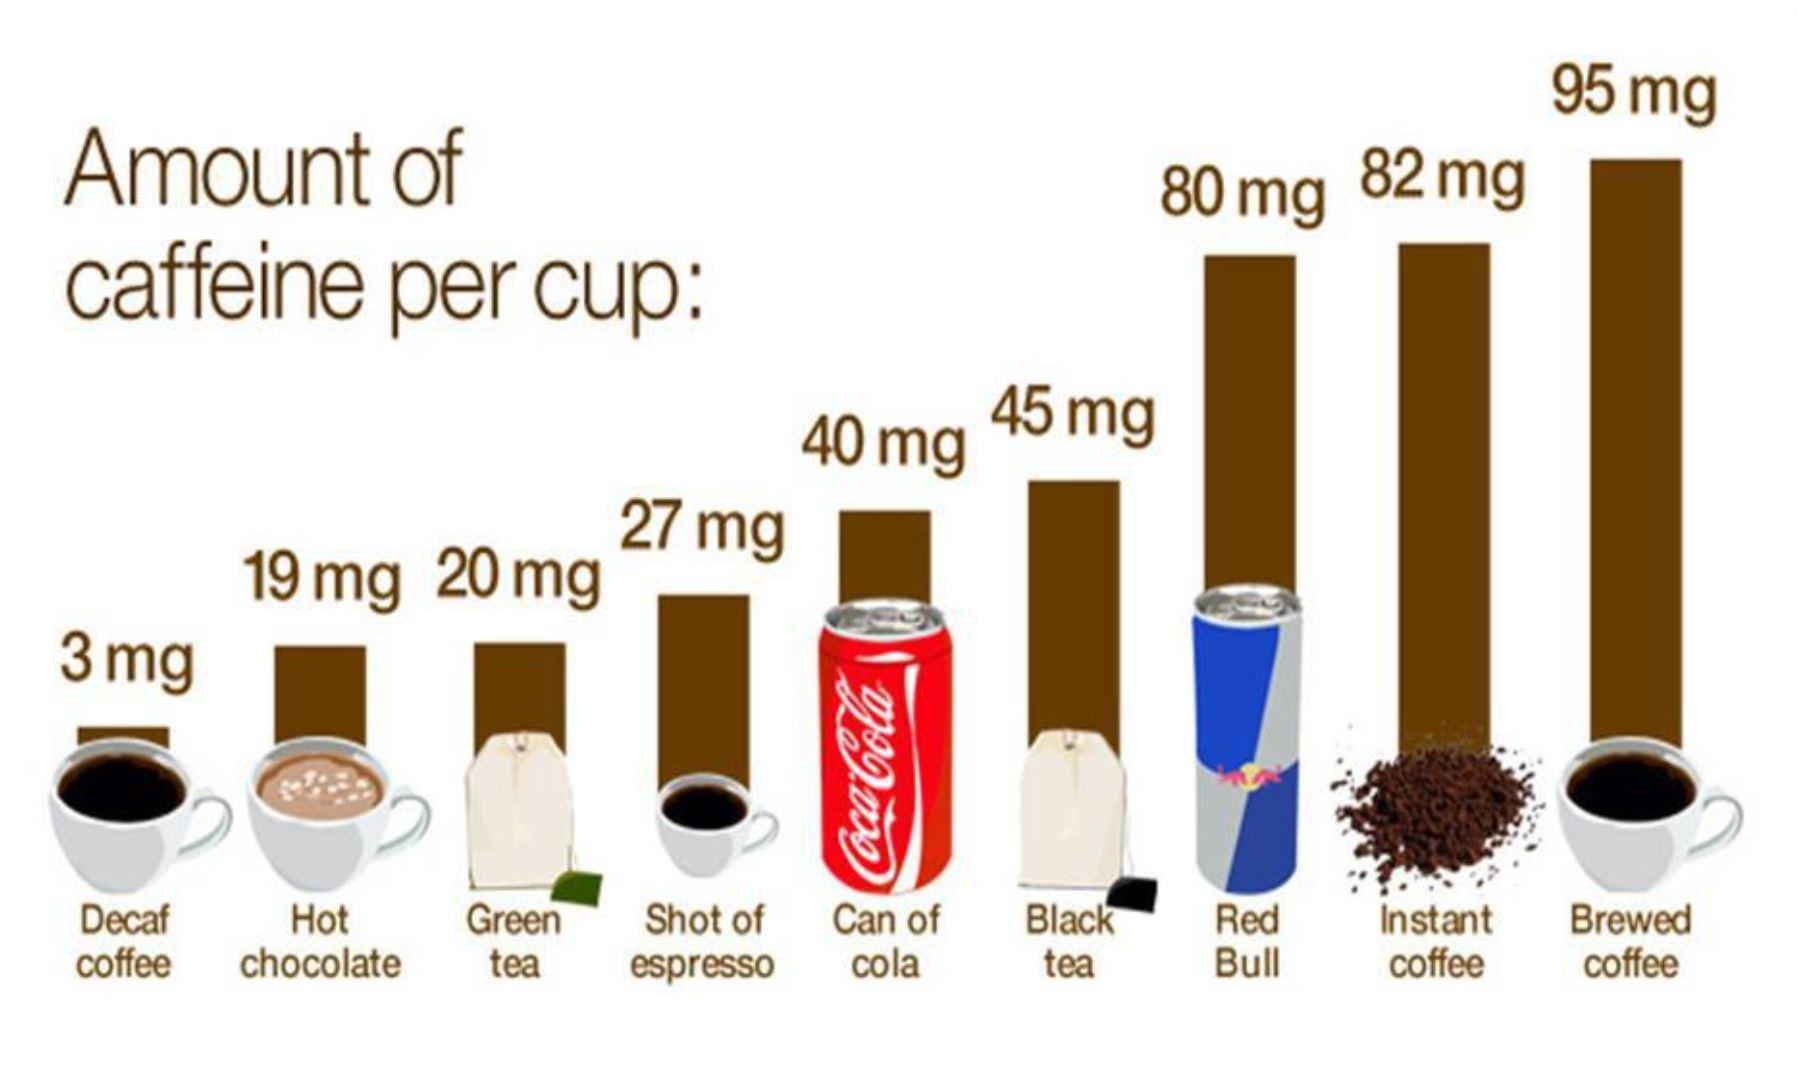 Mängd koffein per dryck kaffe energidryck coca cola te